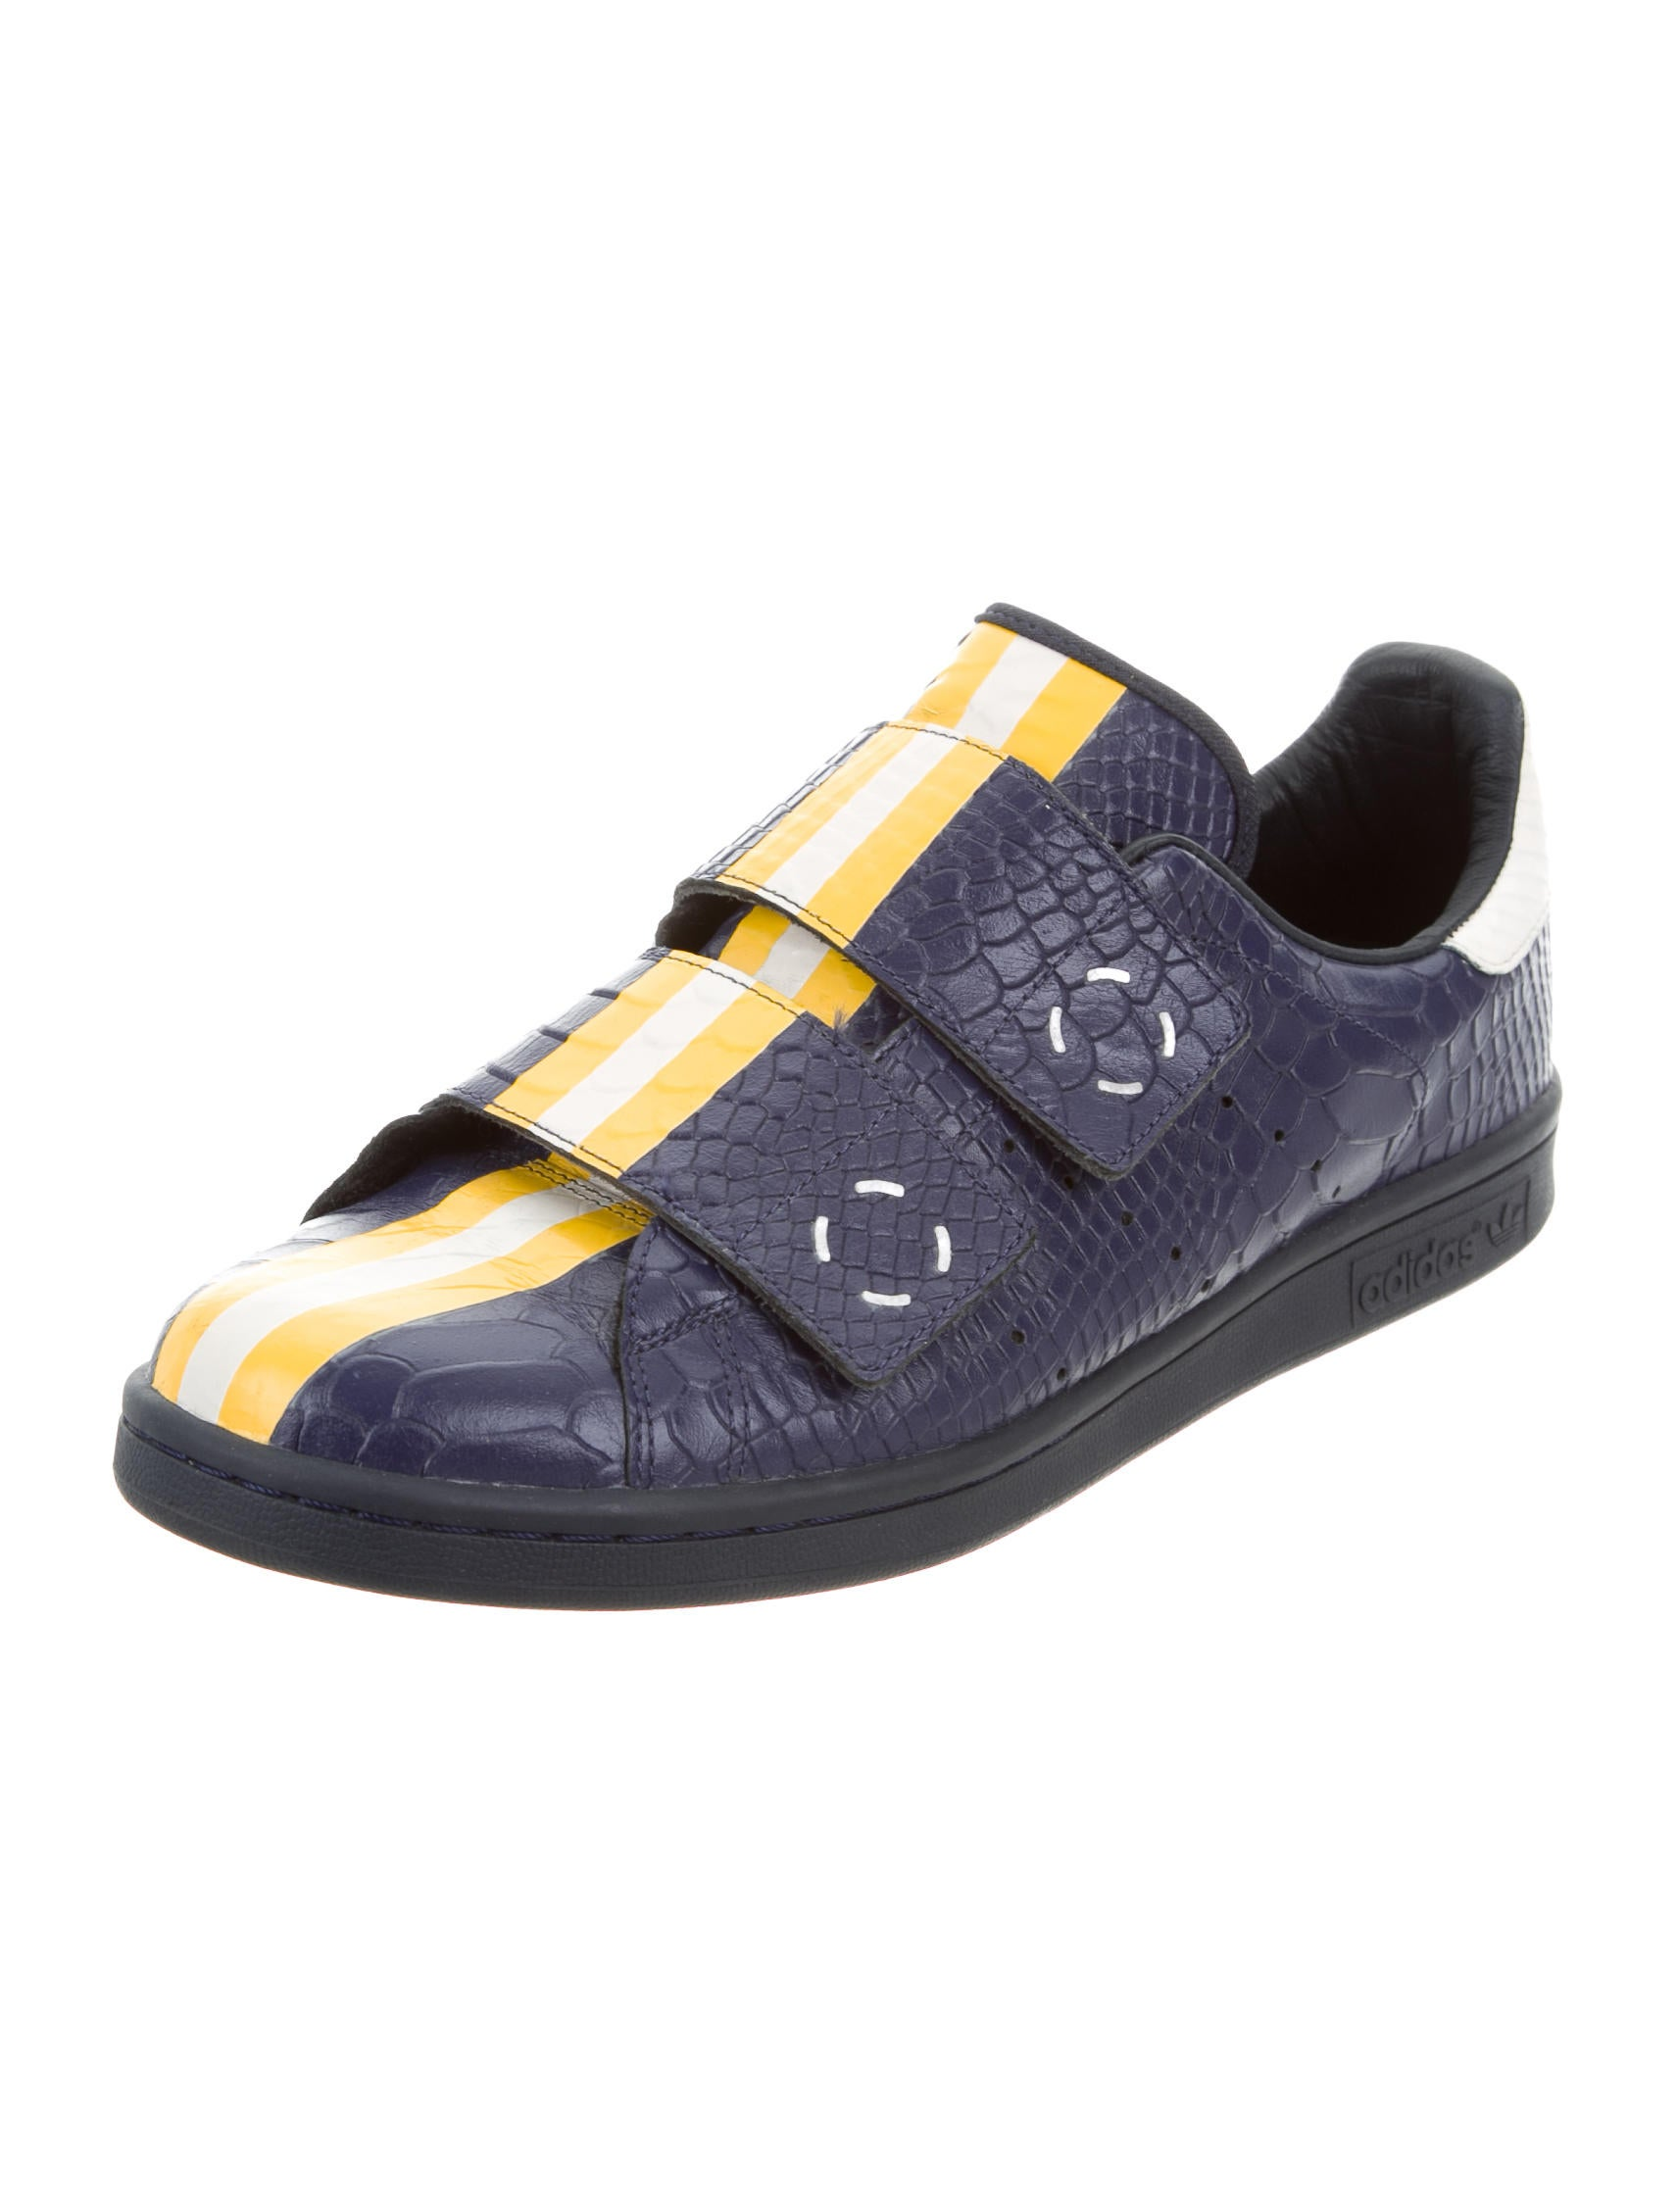 raf simons embossed leather sneakers shoes raf20410. Black Bedroom Furniture Sets. Home Design Ideas